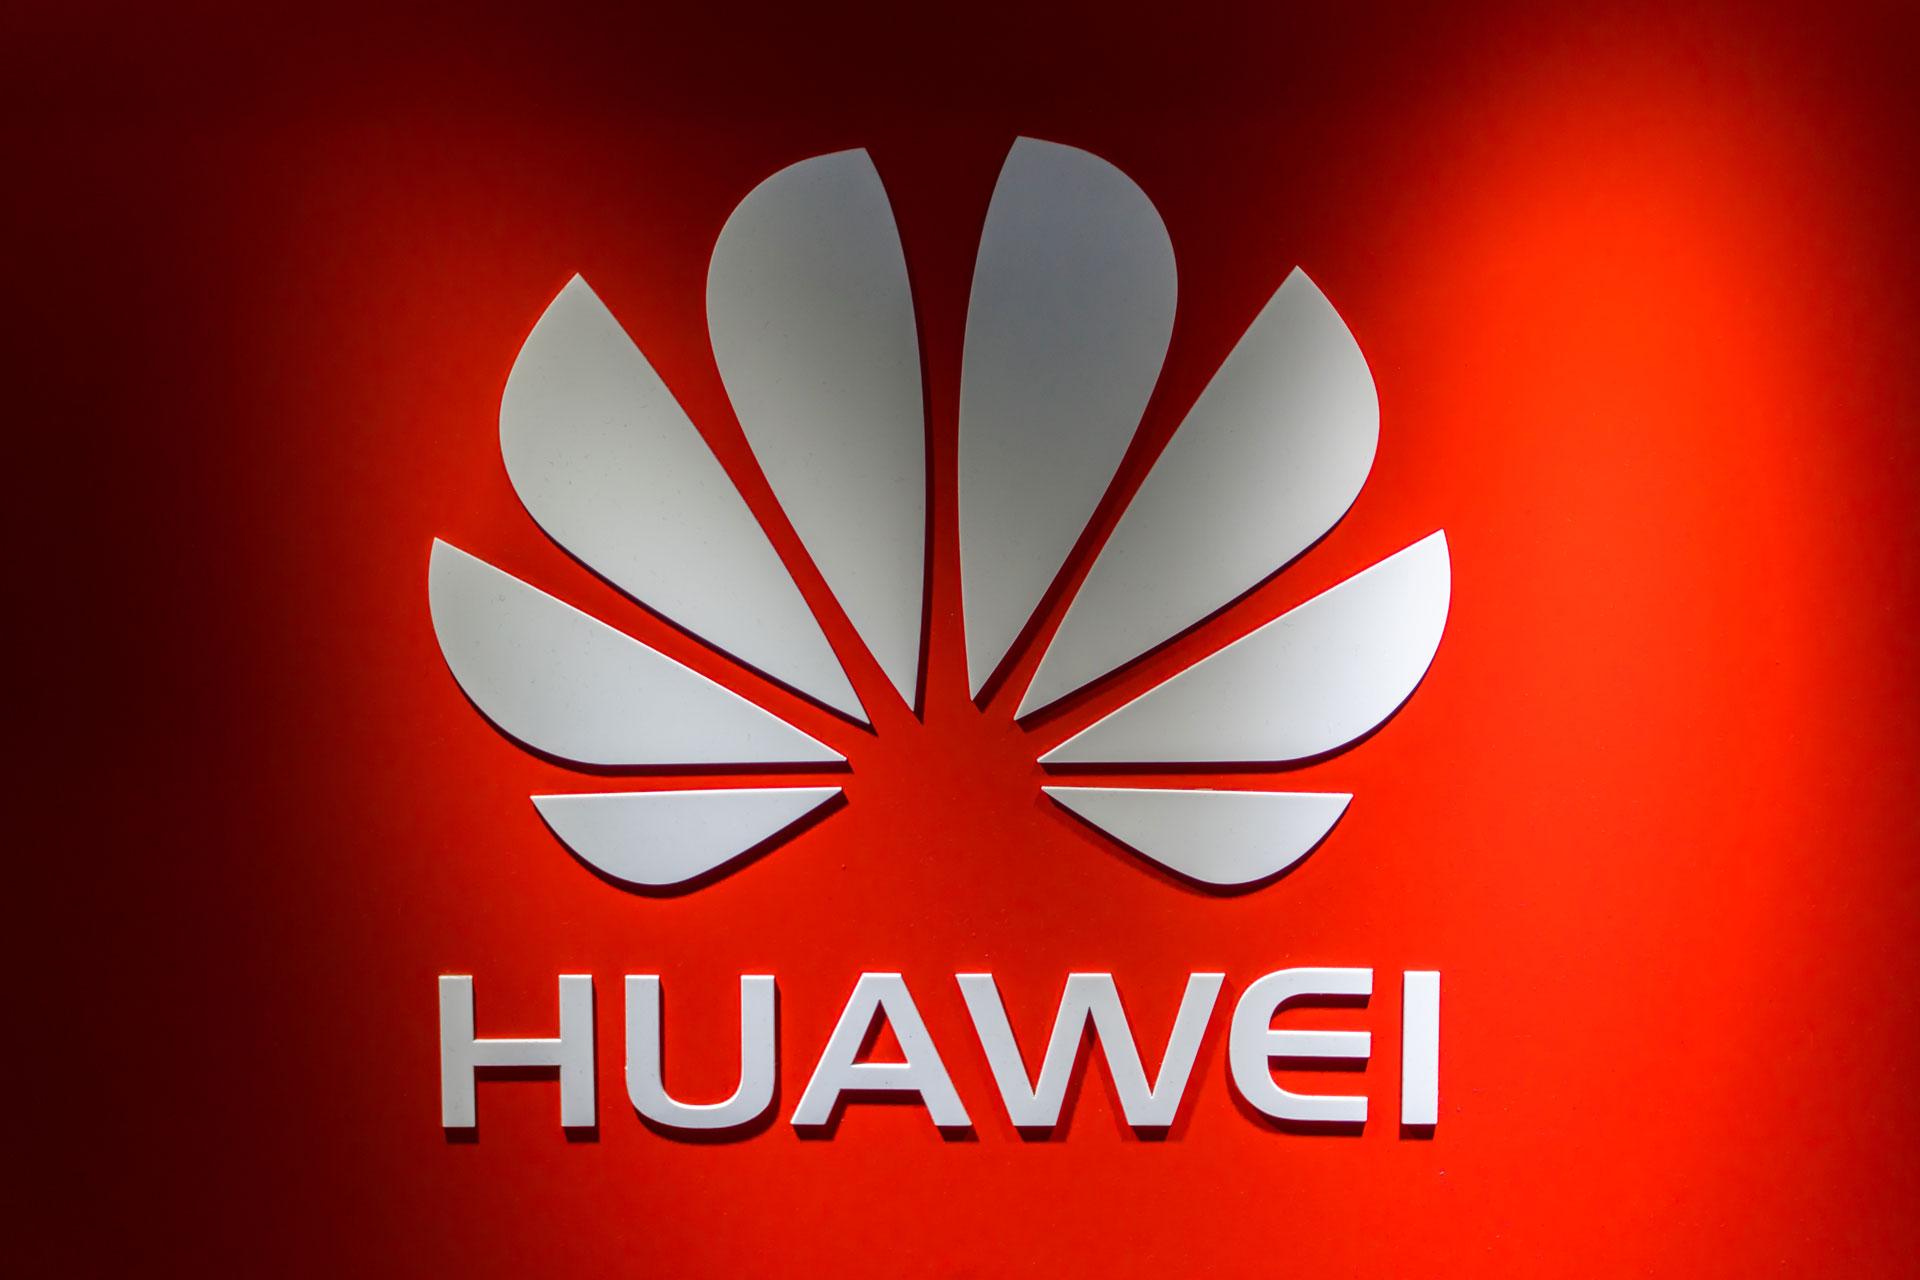 5G gear 5G security standard Huawei